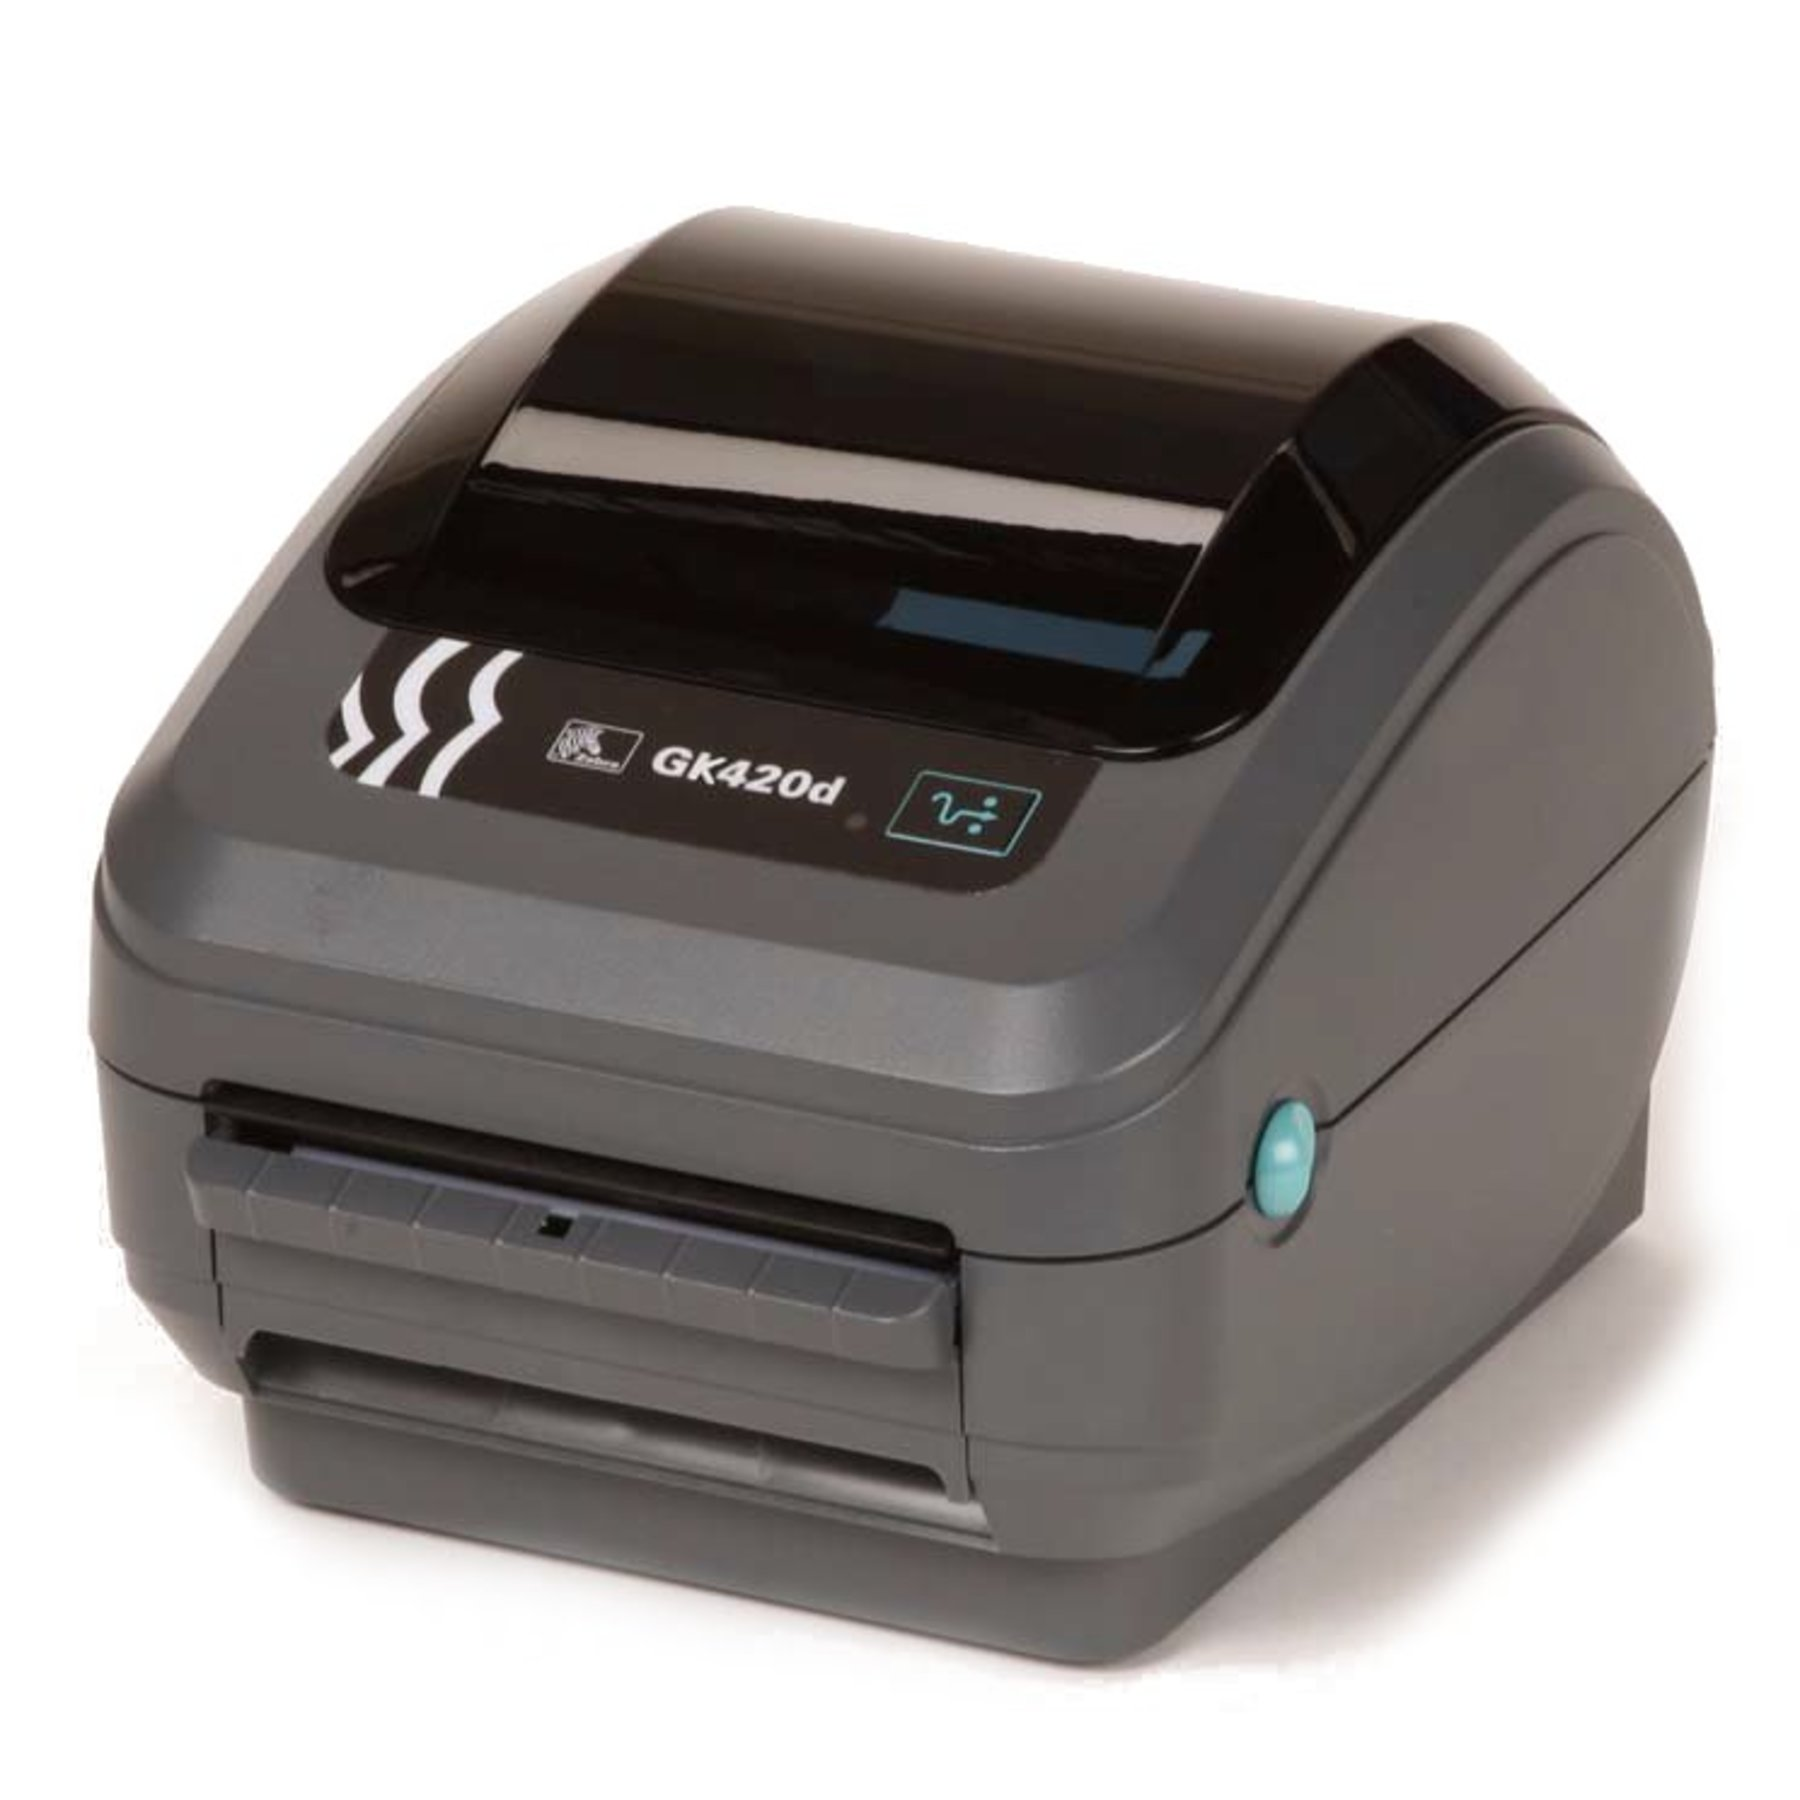 Gk420t desktop printer support & downloads | zebra.